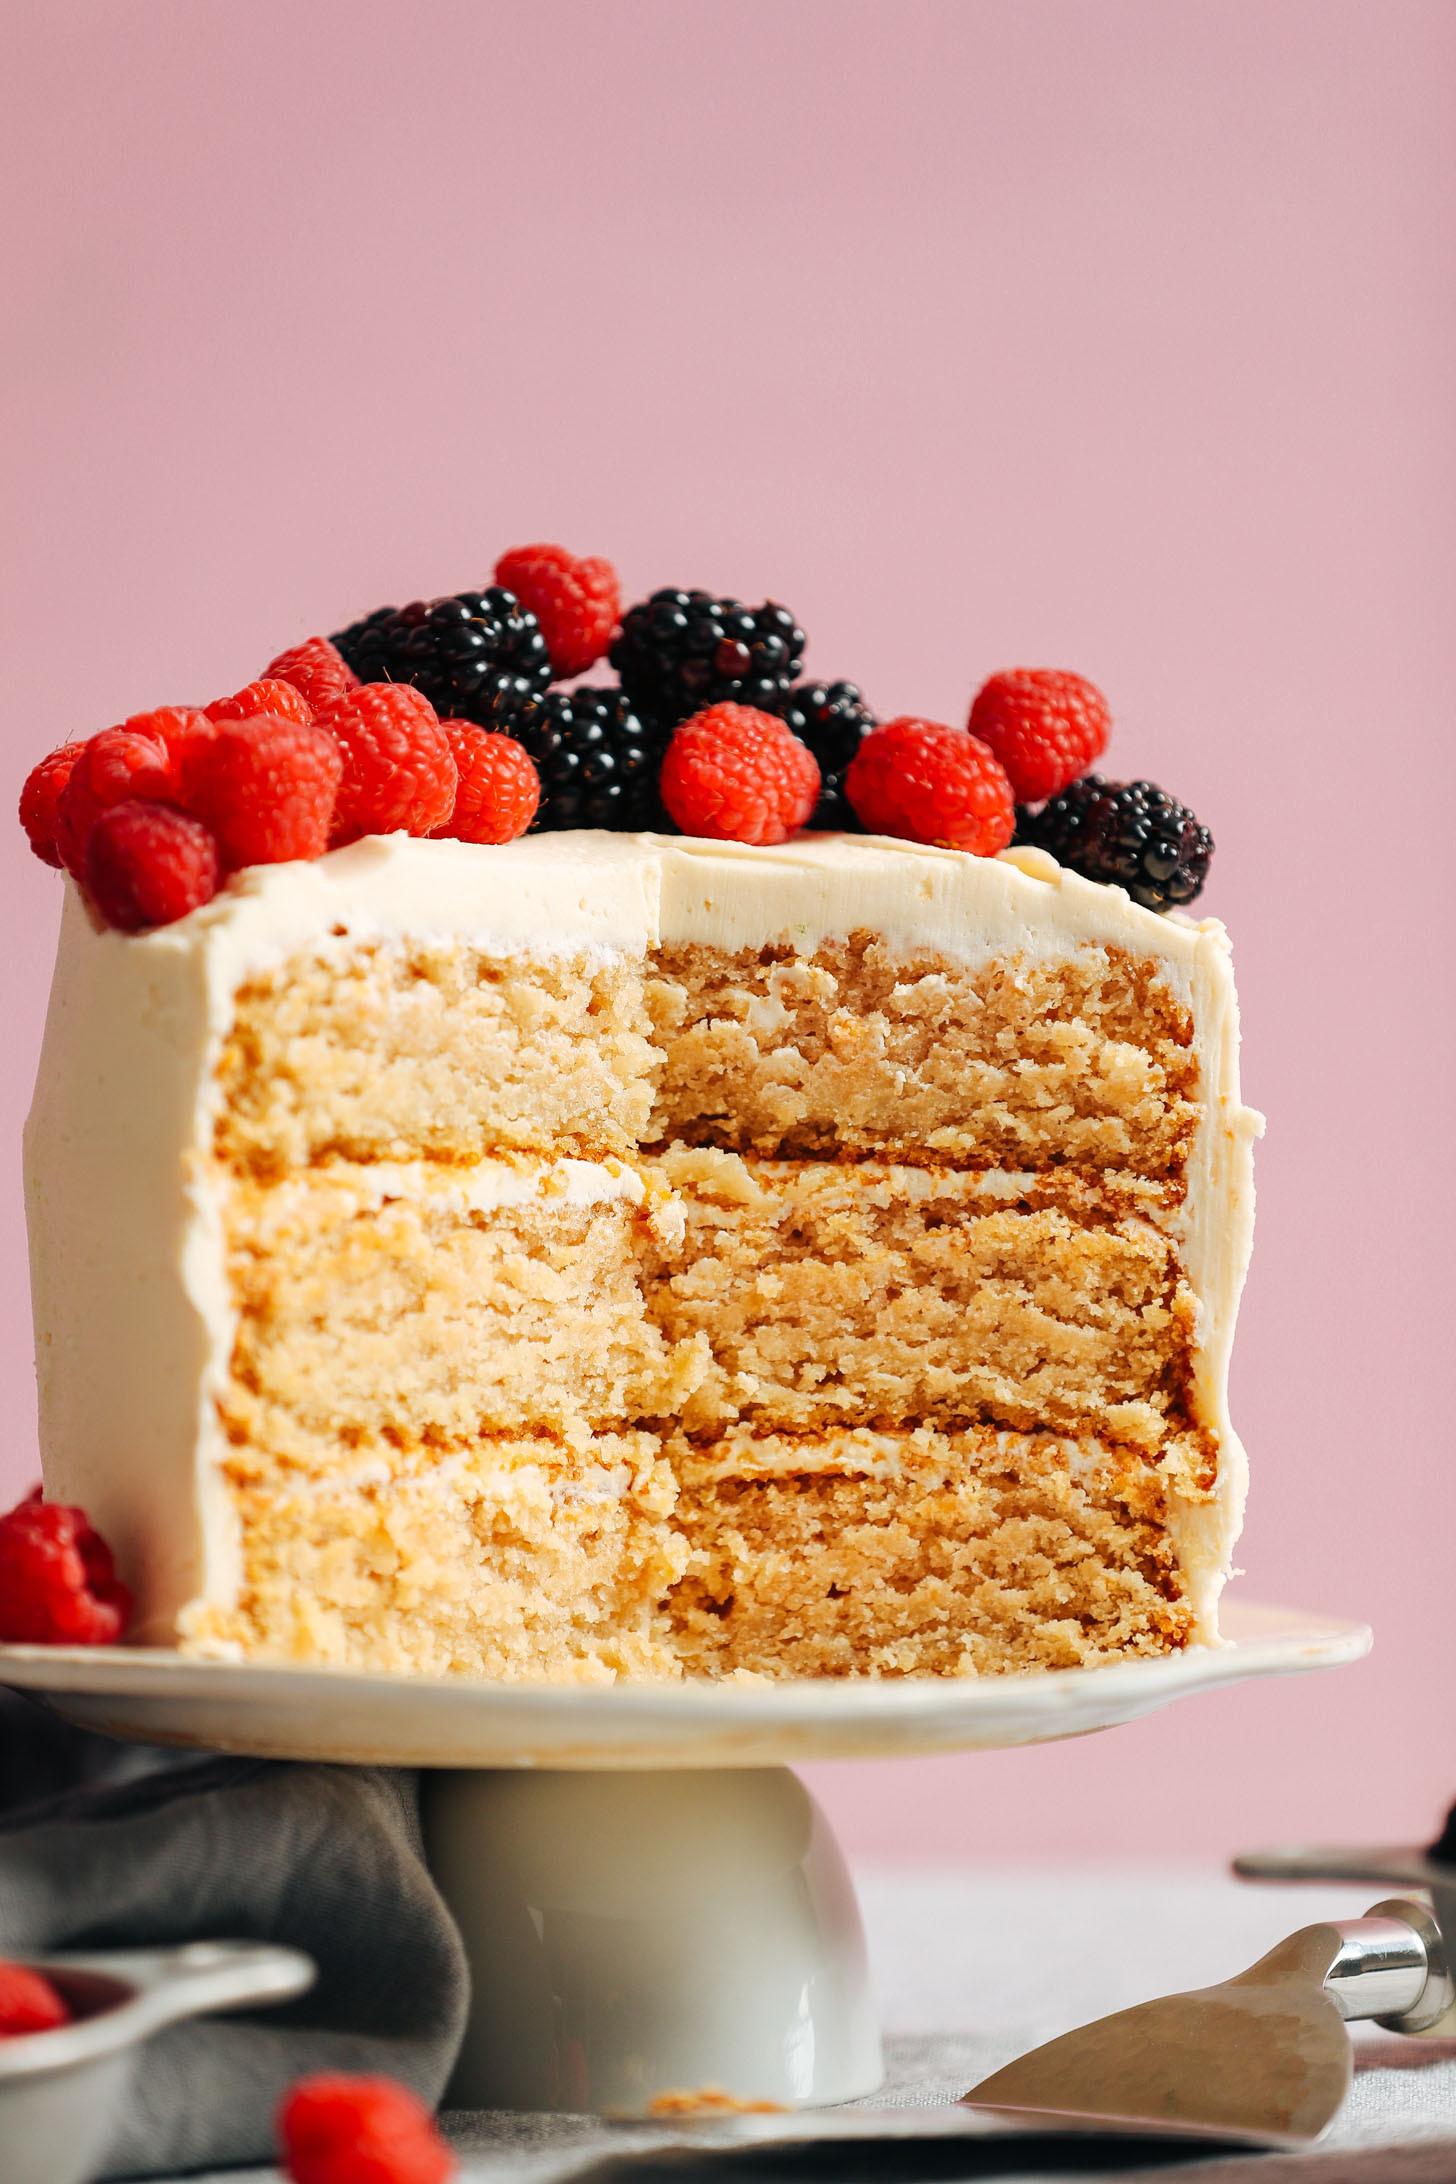 Gluten And Dairy Free Cake Recipes Easy  1 Bowl Vegan Gluten Free Vanilla Cake